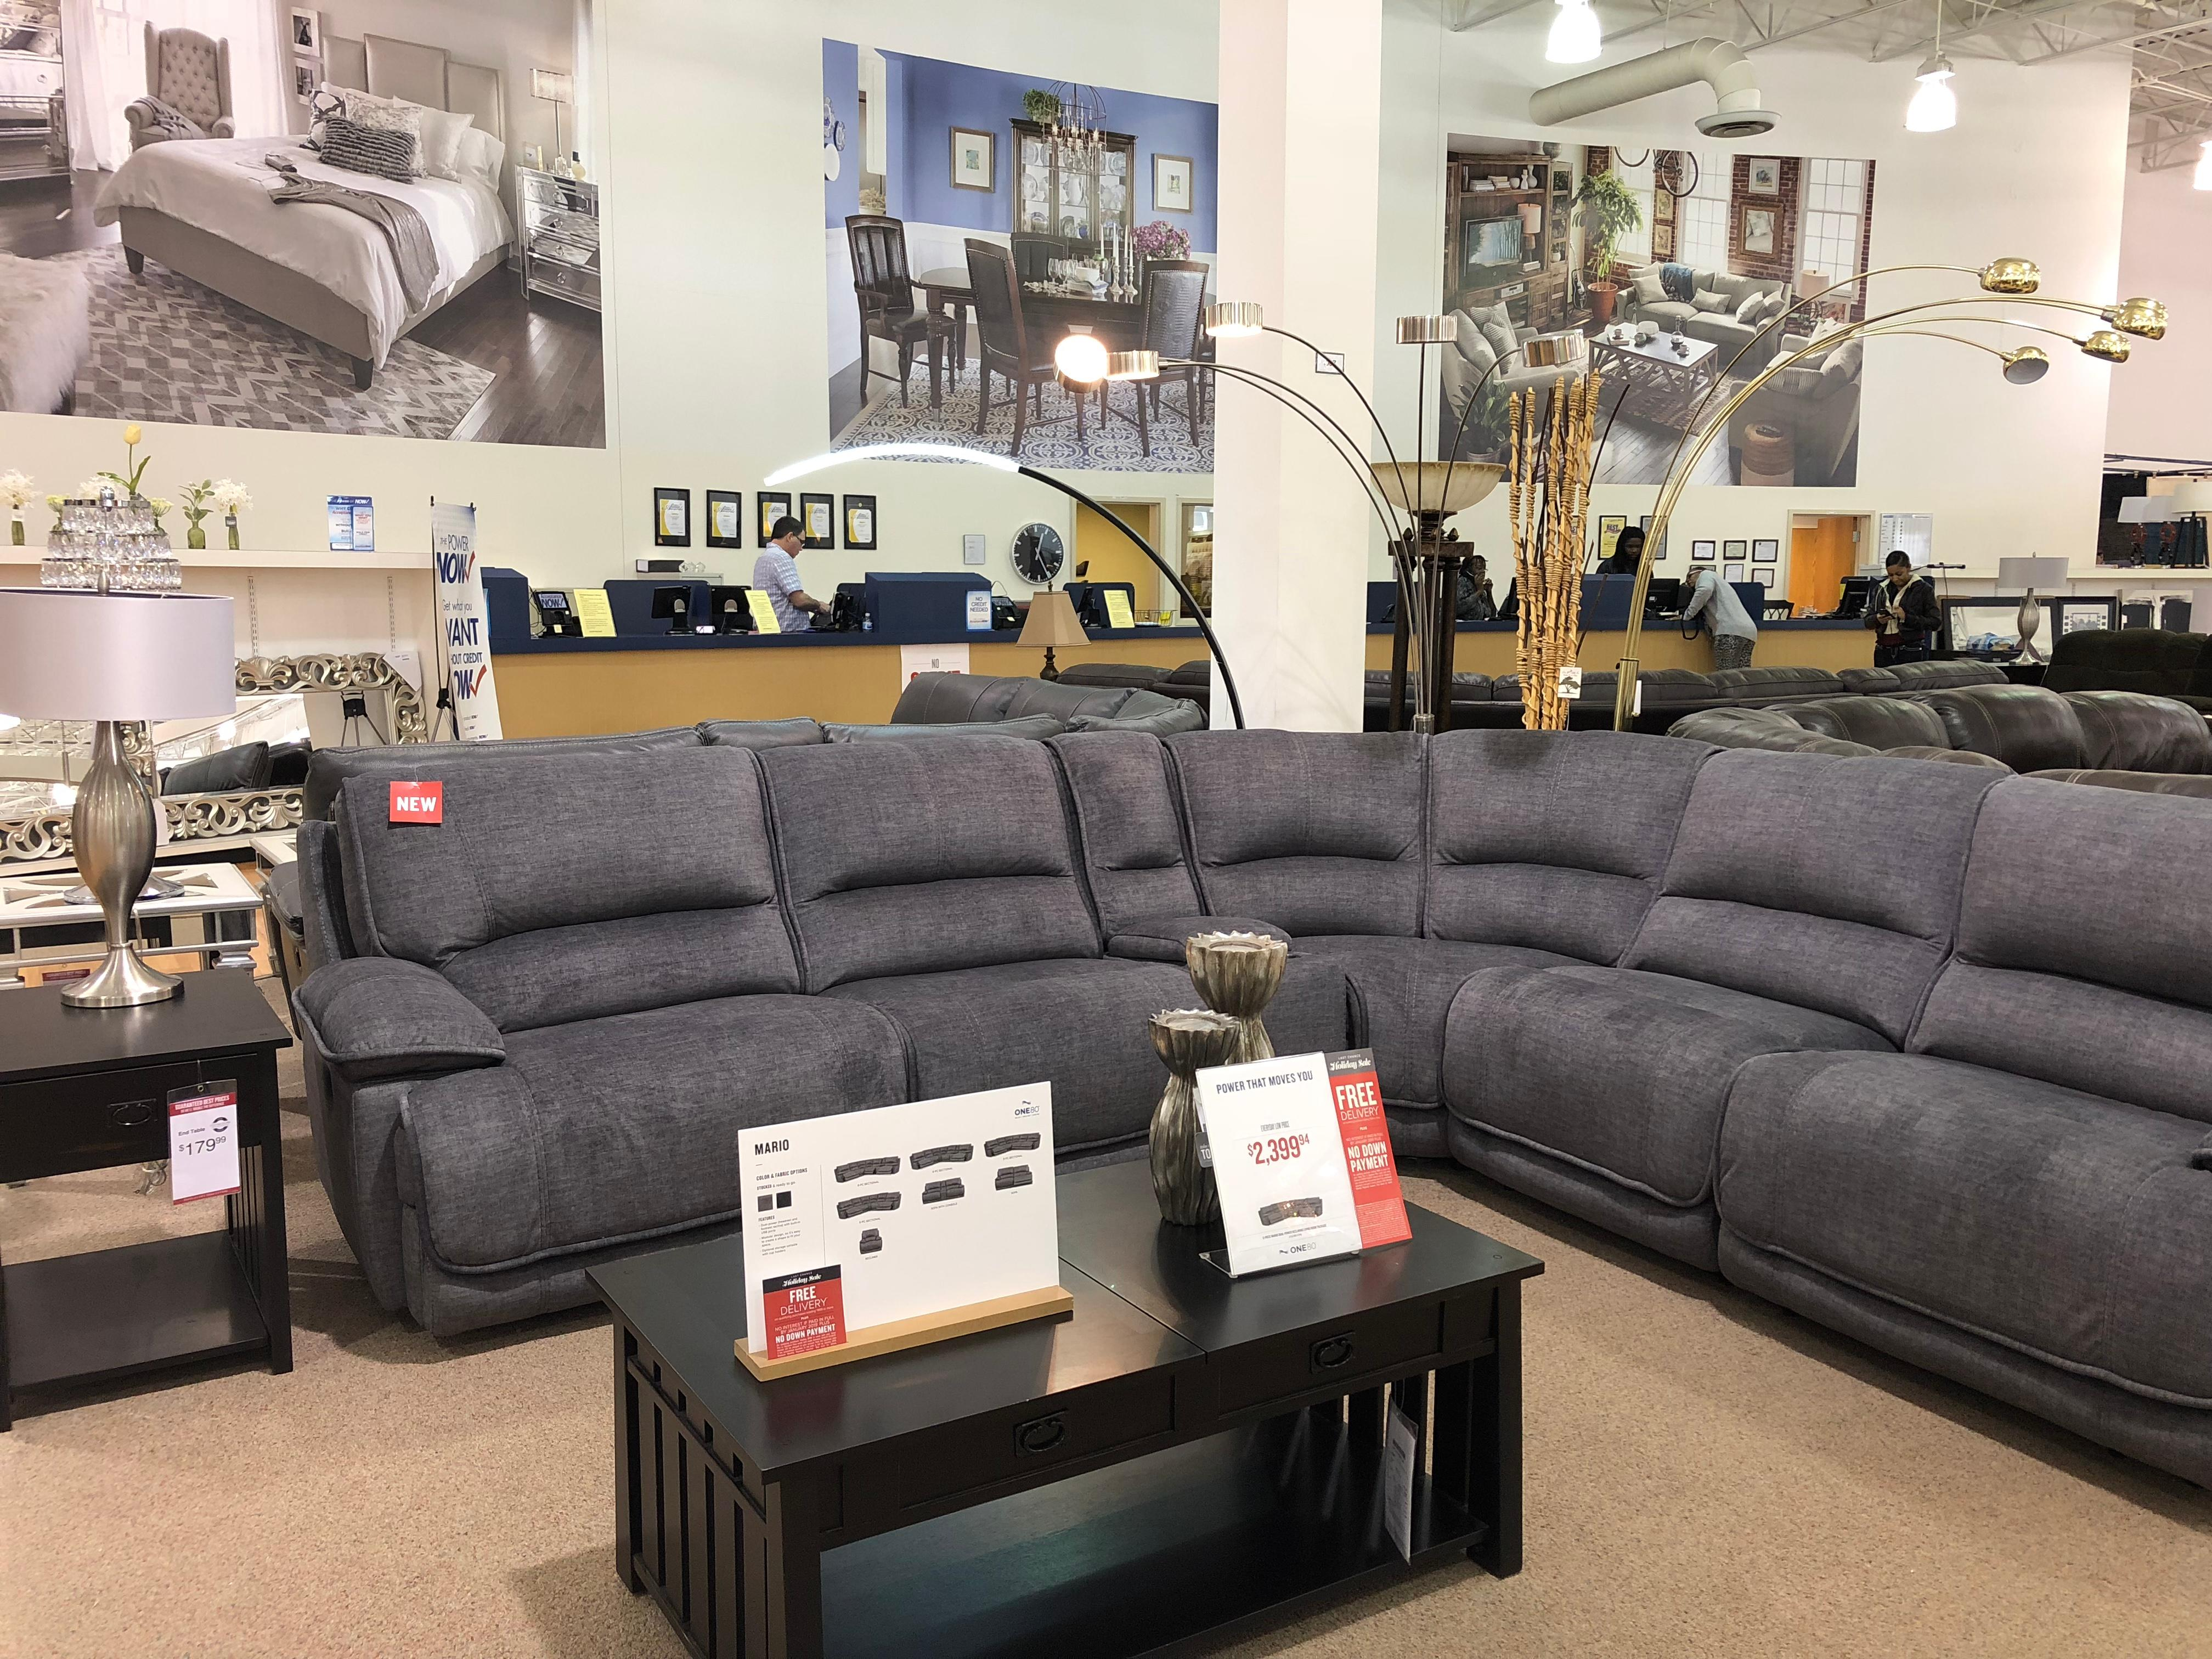 Value City Furniture image 3